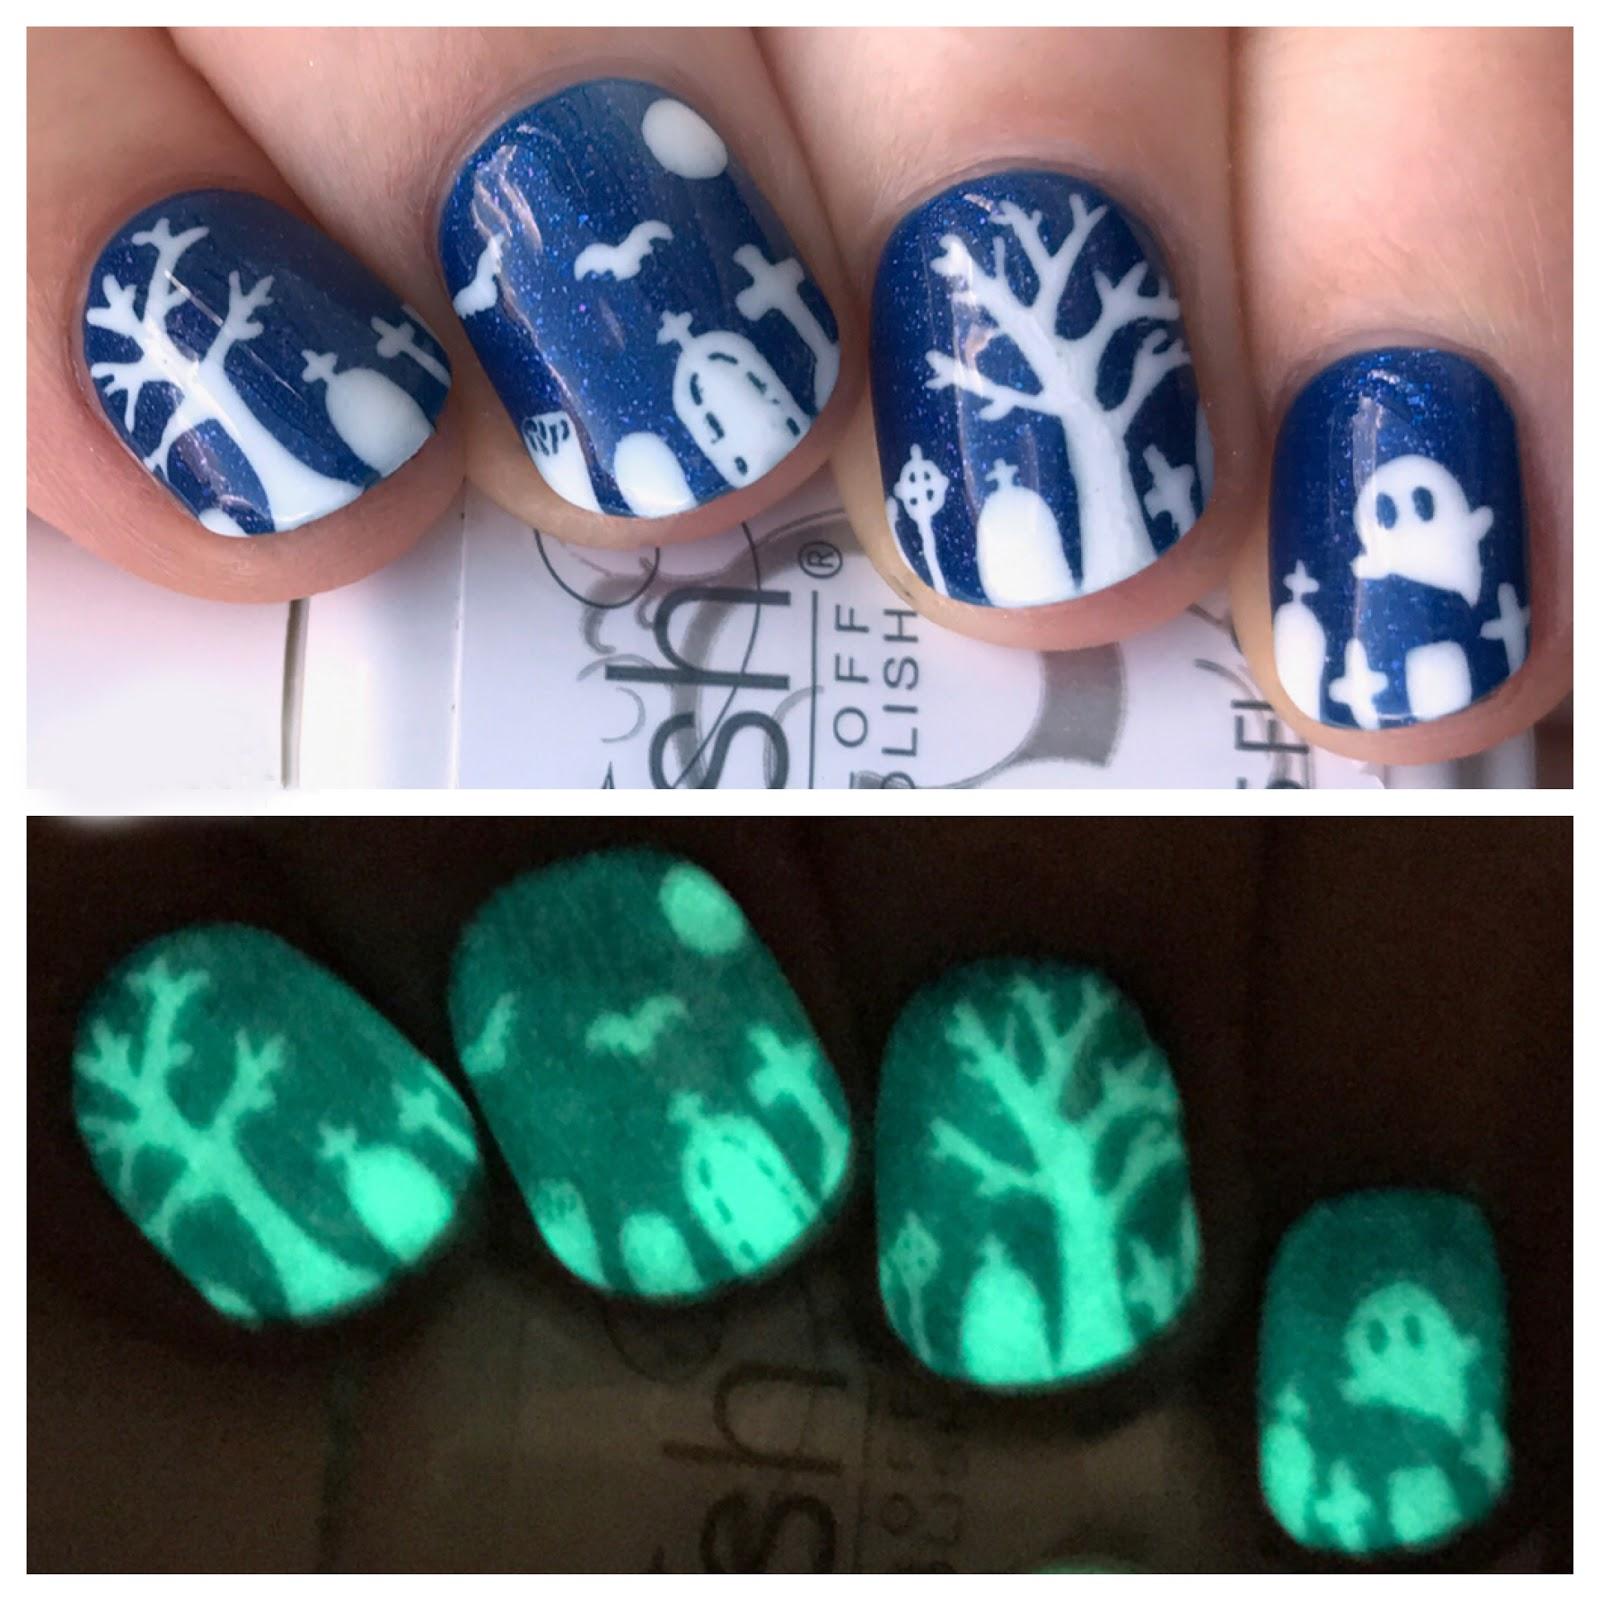 Gelish Glow In The Dark Polish + Halloween Nail Art | One Nail To ...